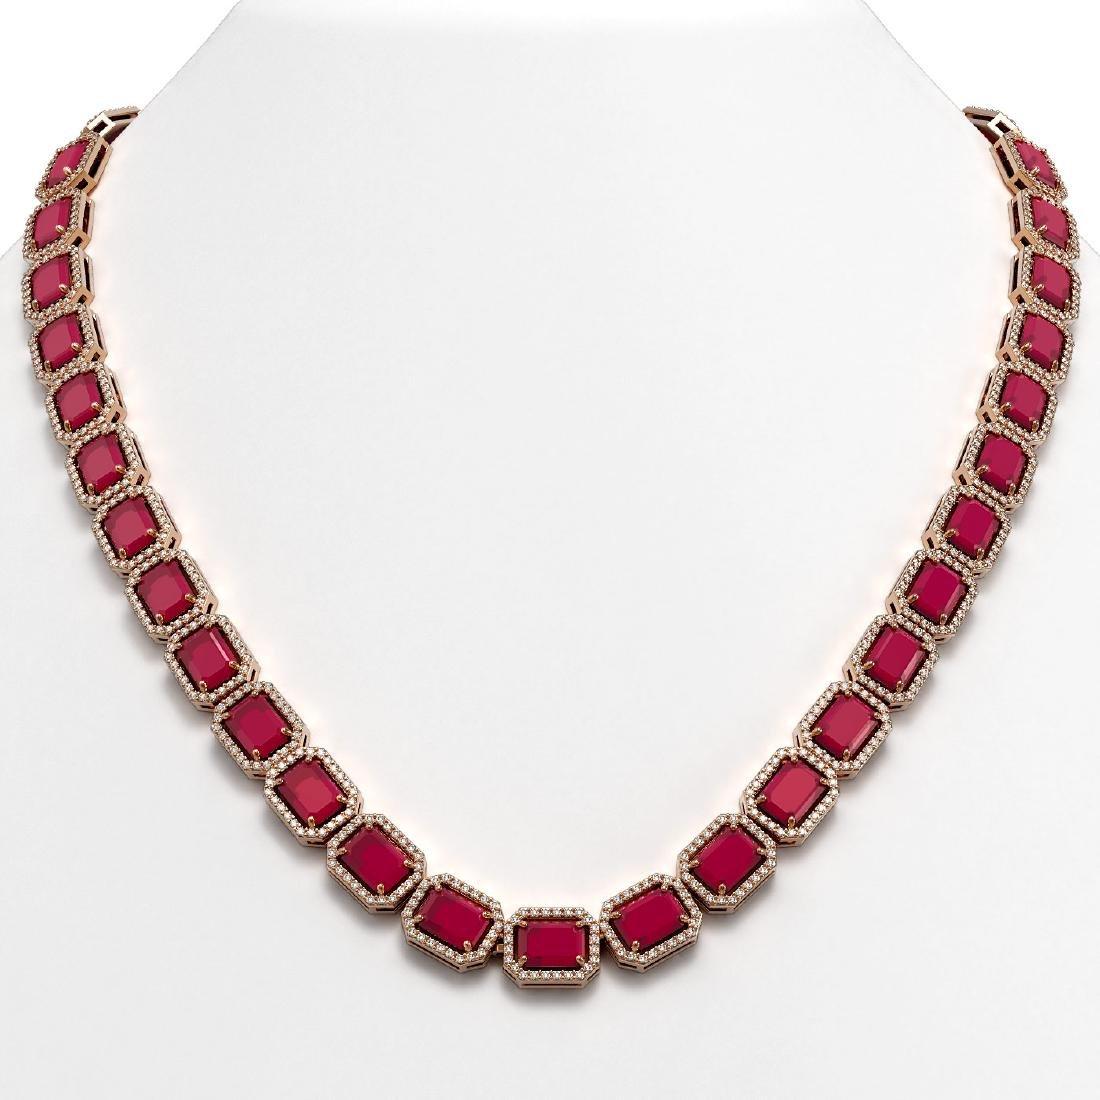 58.59 CTW Ruby & Diamond Halo Necklace 10K Rose Gold